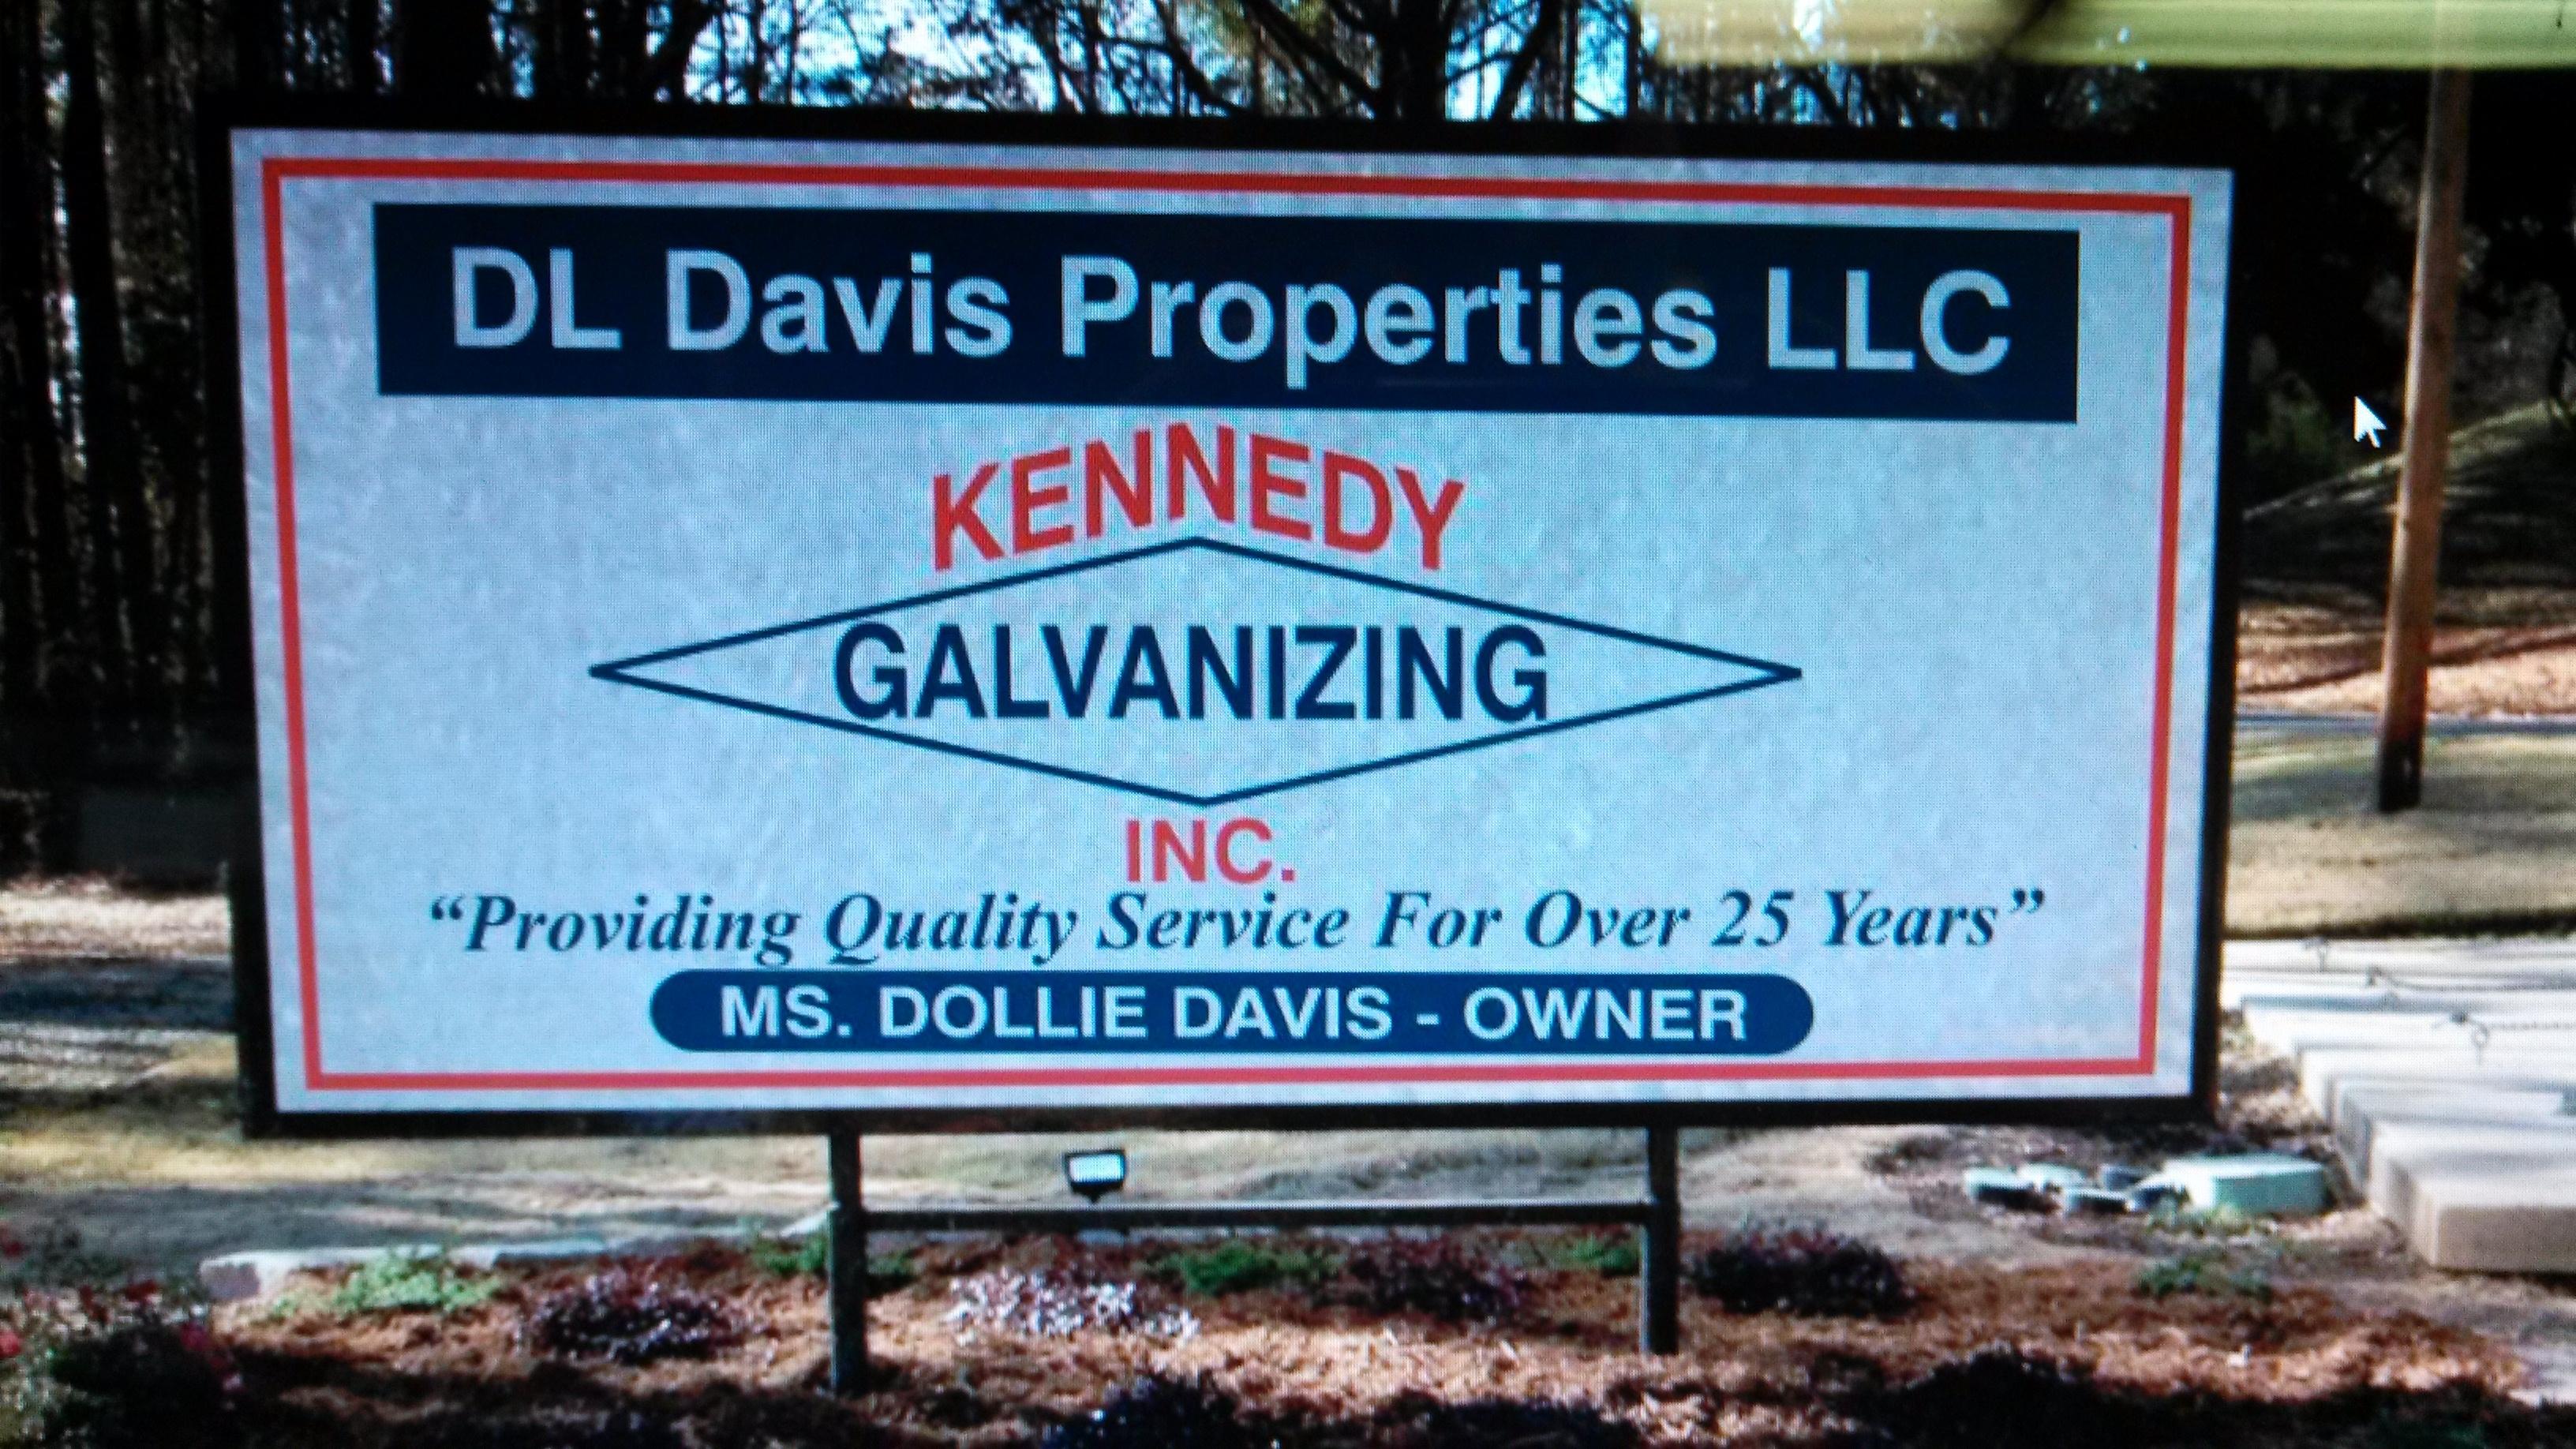 Kennedy Galvanizing, Inc.